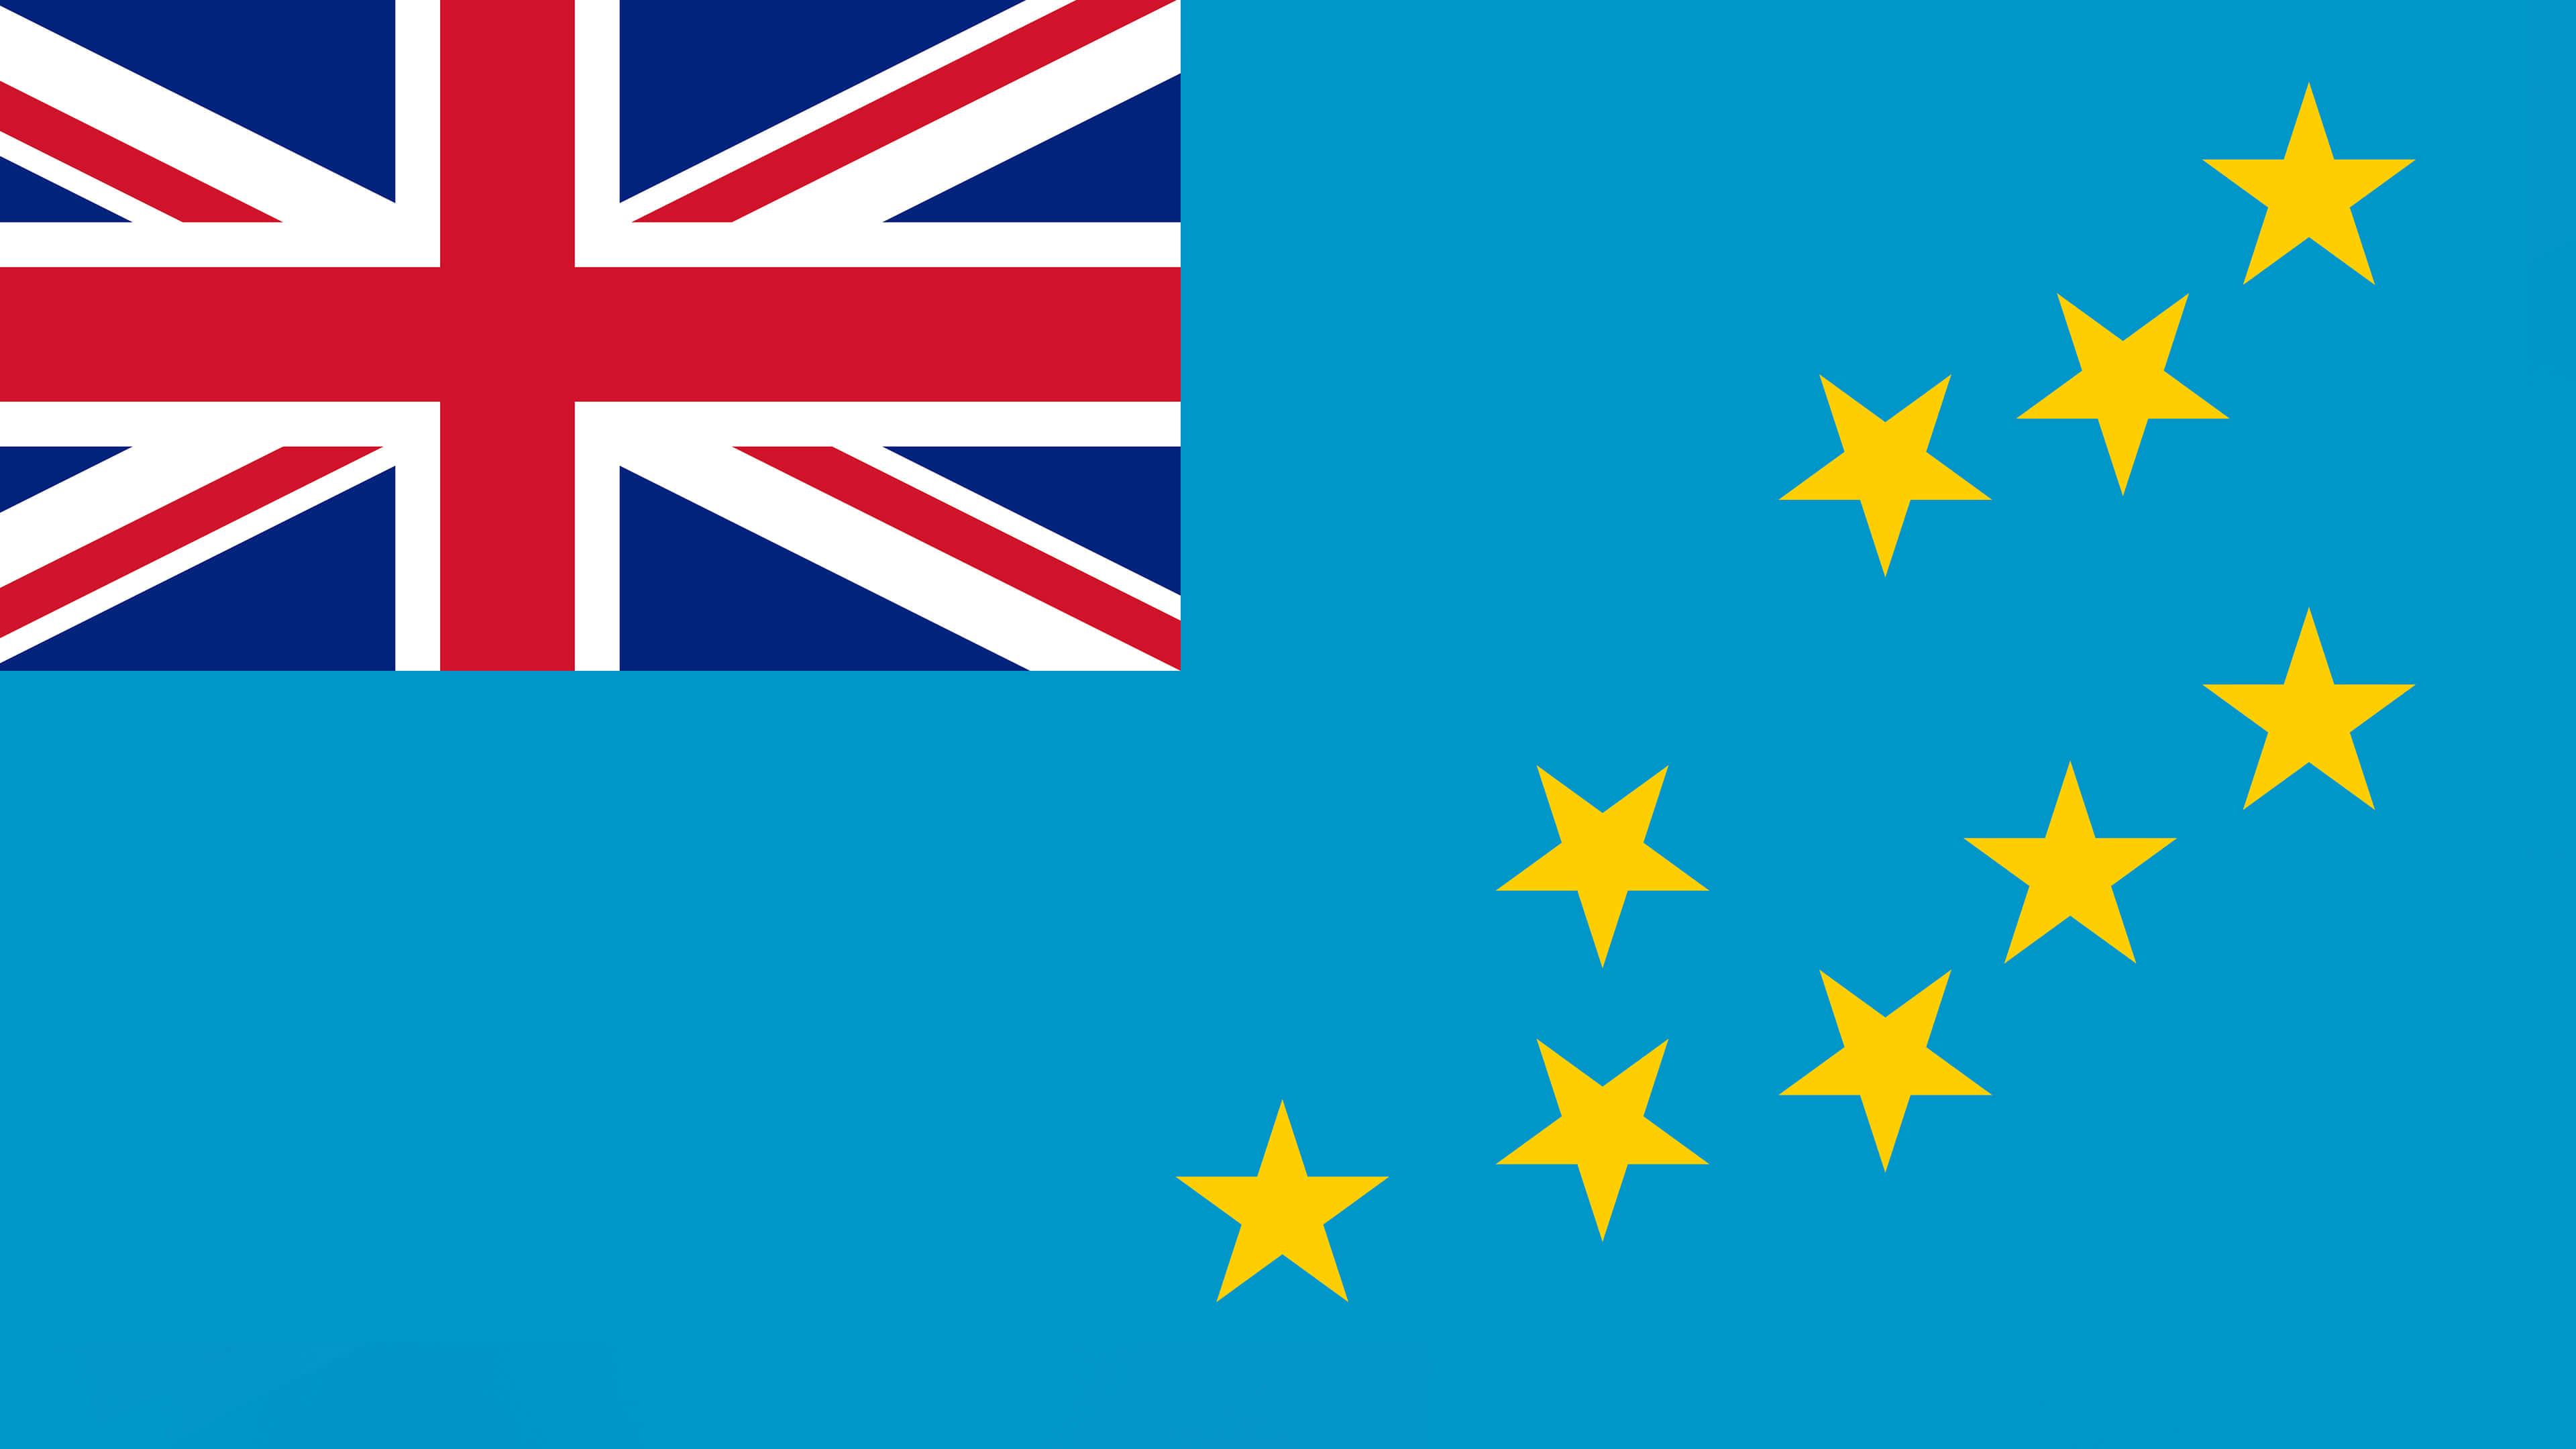 Tuvalu Flag UHD 4K Wallpaper Pixelz 3840x2160